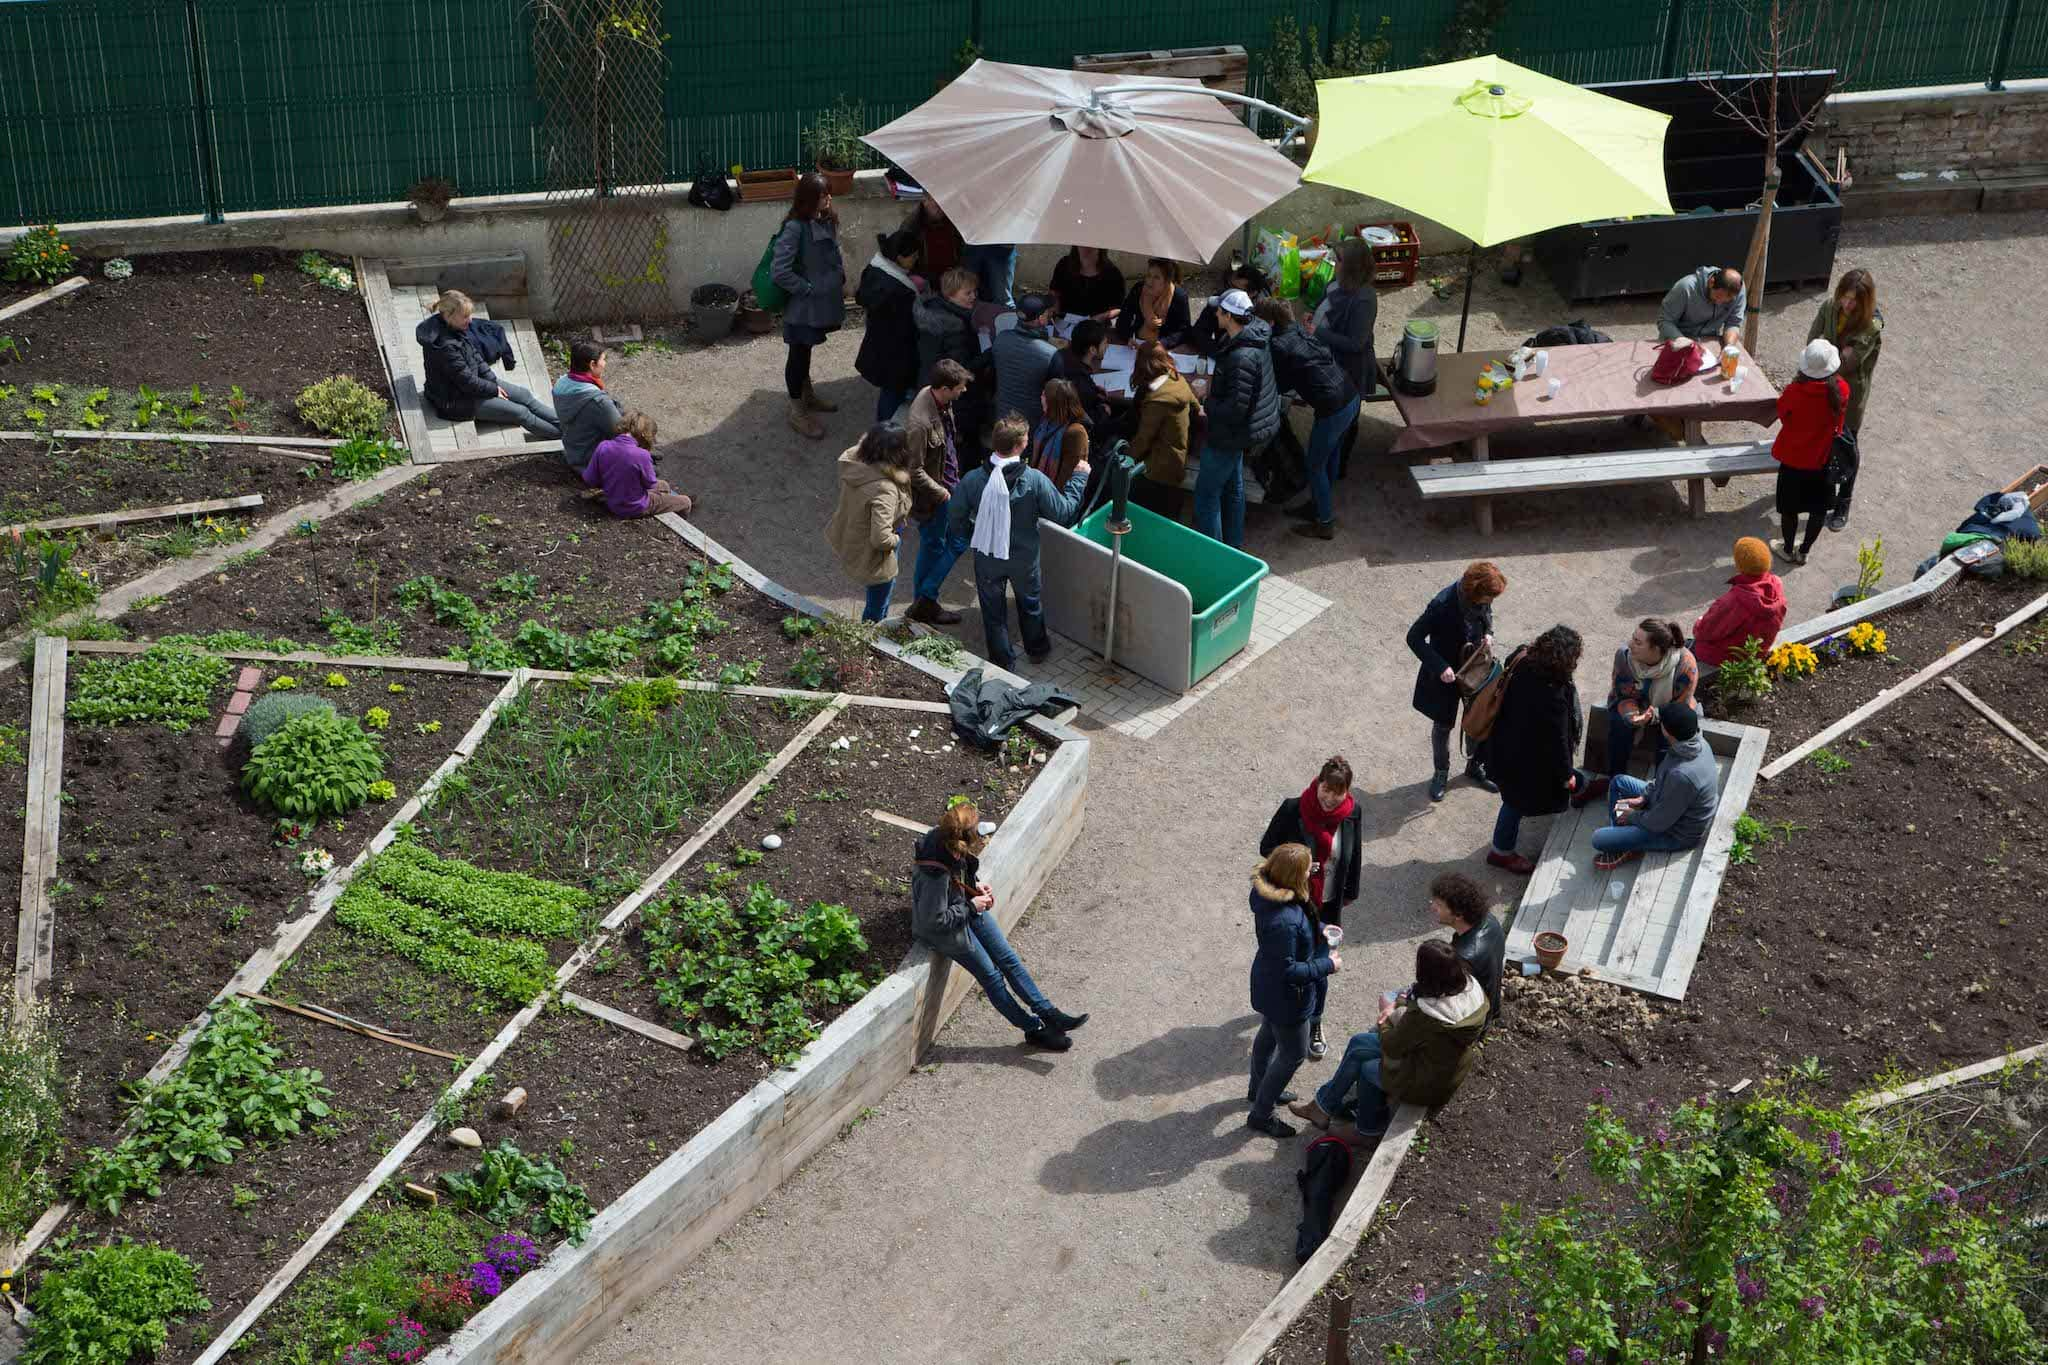 Le jardin partagé de la Grossau. Photo : FL / Rue89 Strasbourg / cc